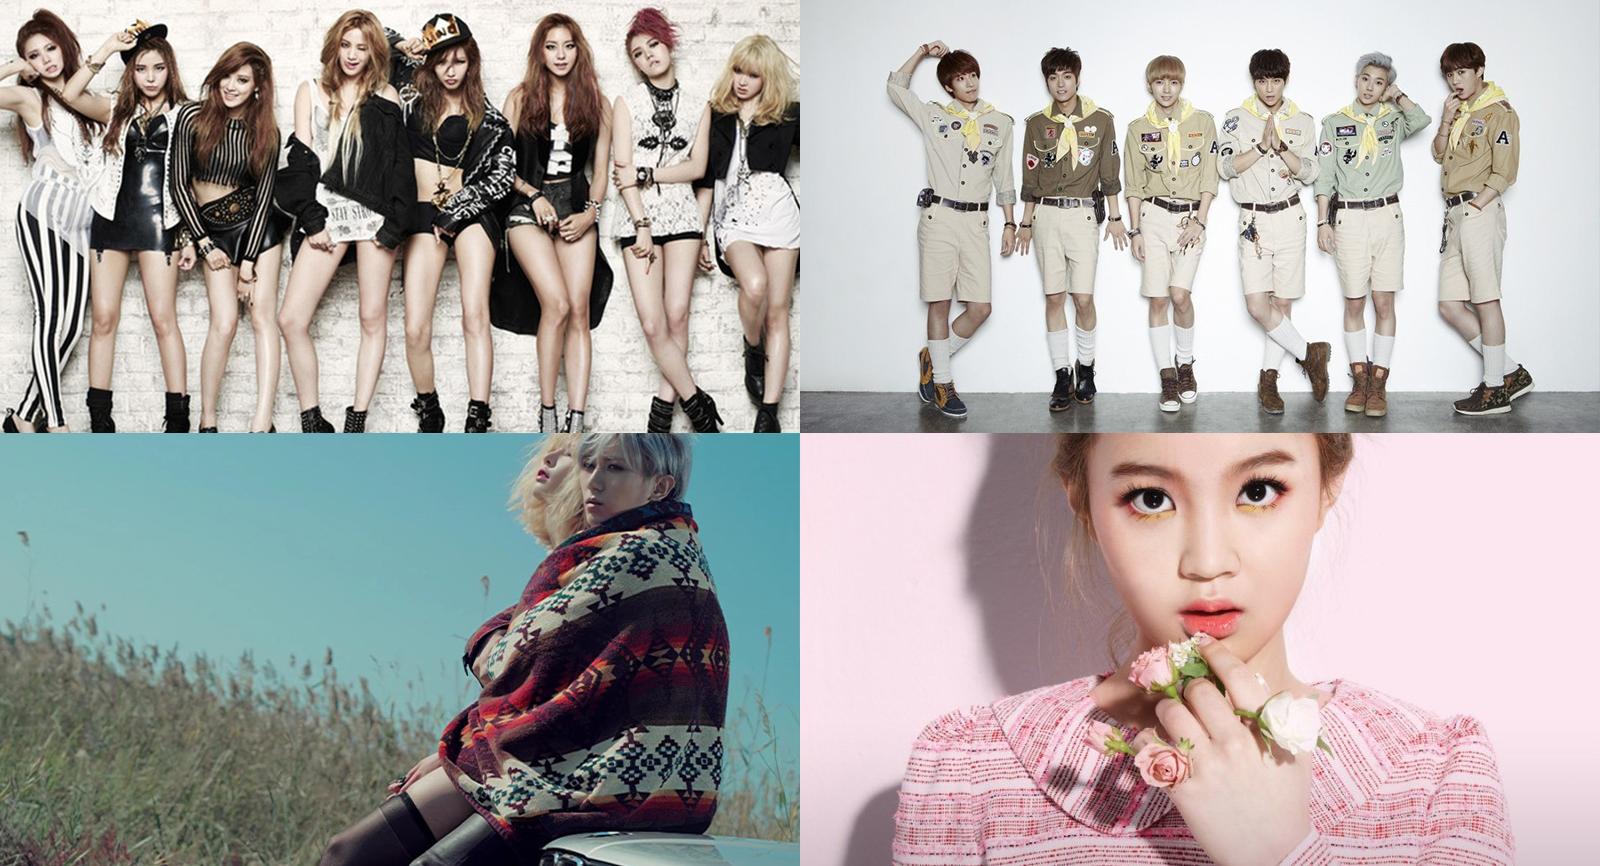 kpop wanted comebacks